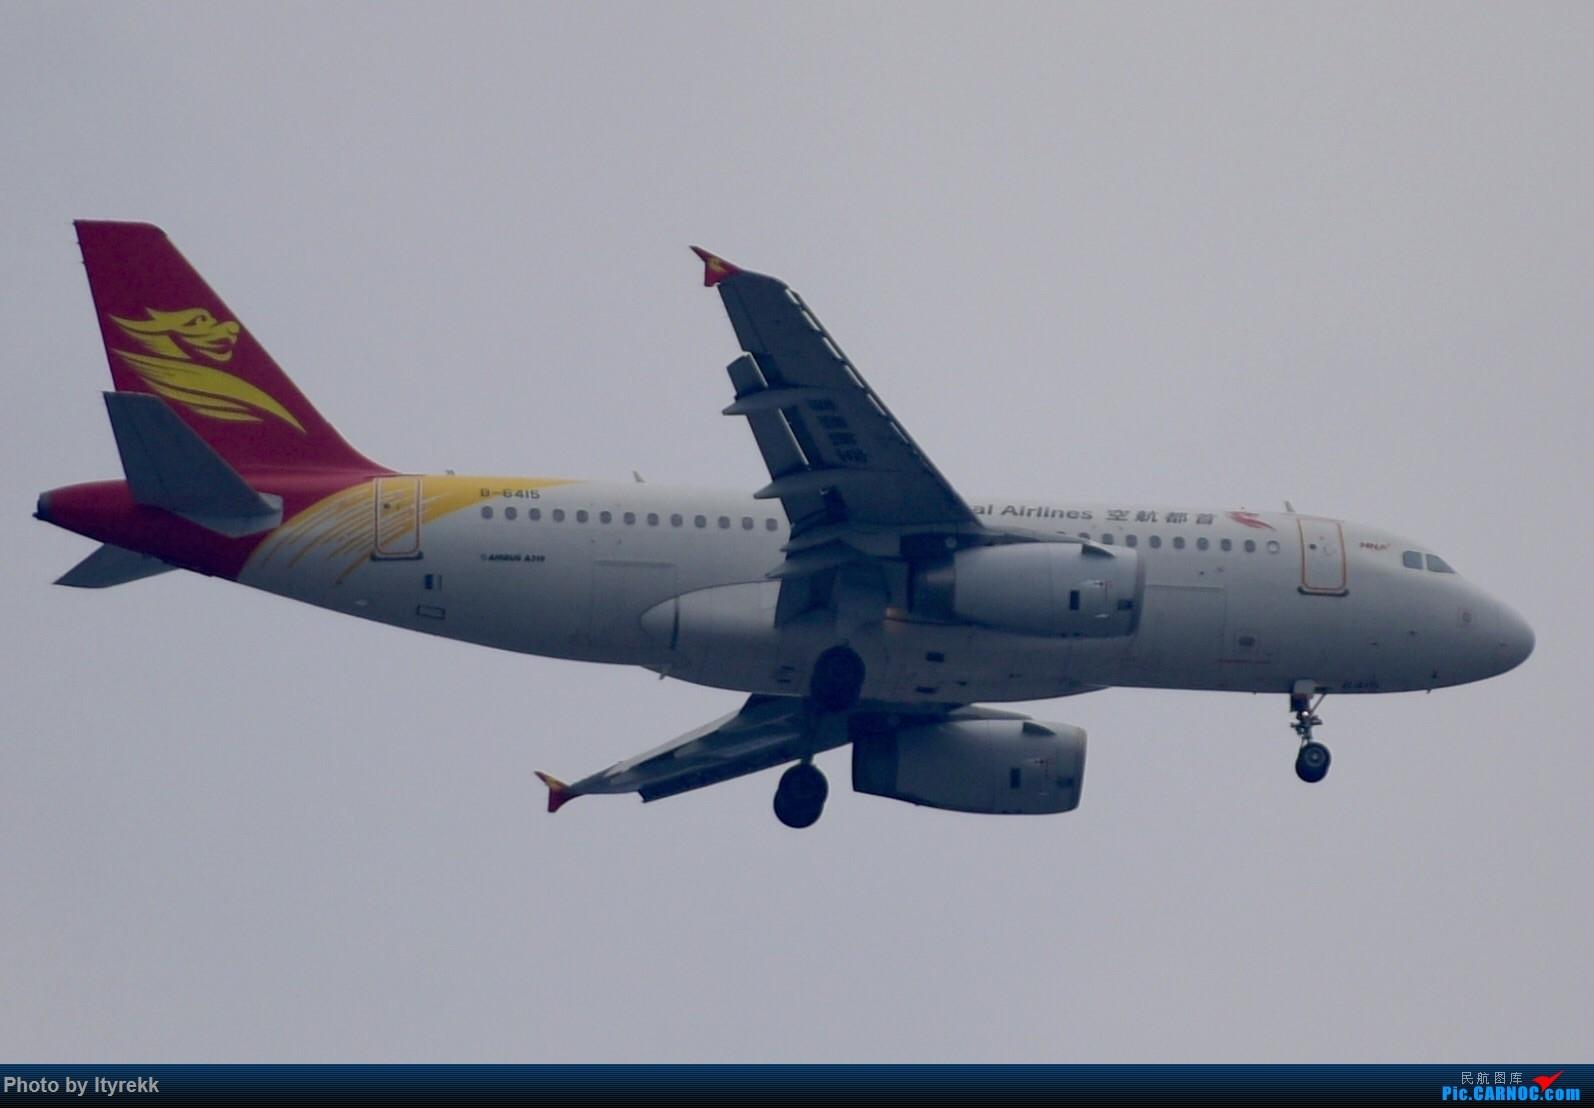 Re:[原创]6月的天气总是变化多端 AIRBUS A319-100 B-6415 中国芒市机场